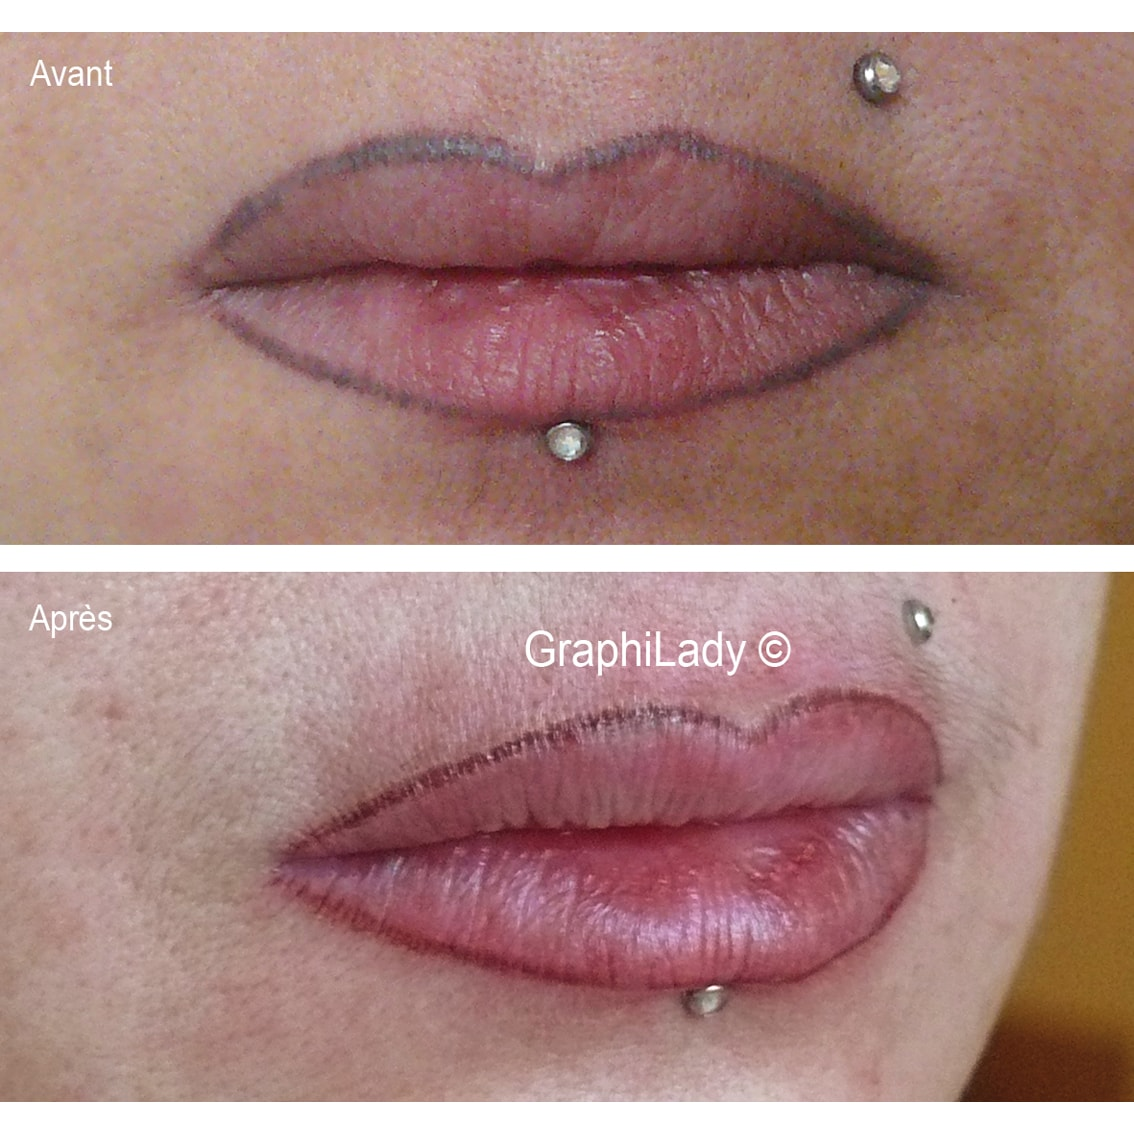 maquillage semi-permanent Recouvrement 09